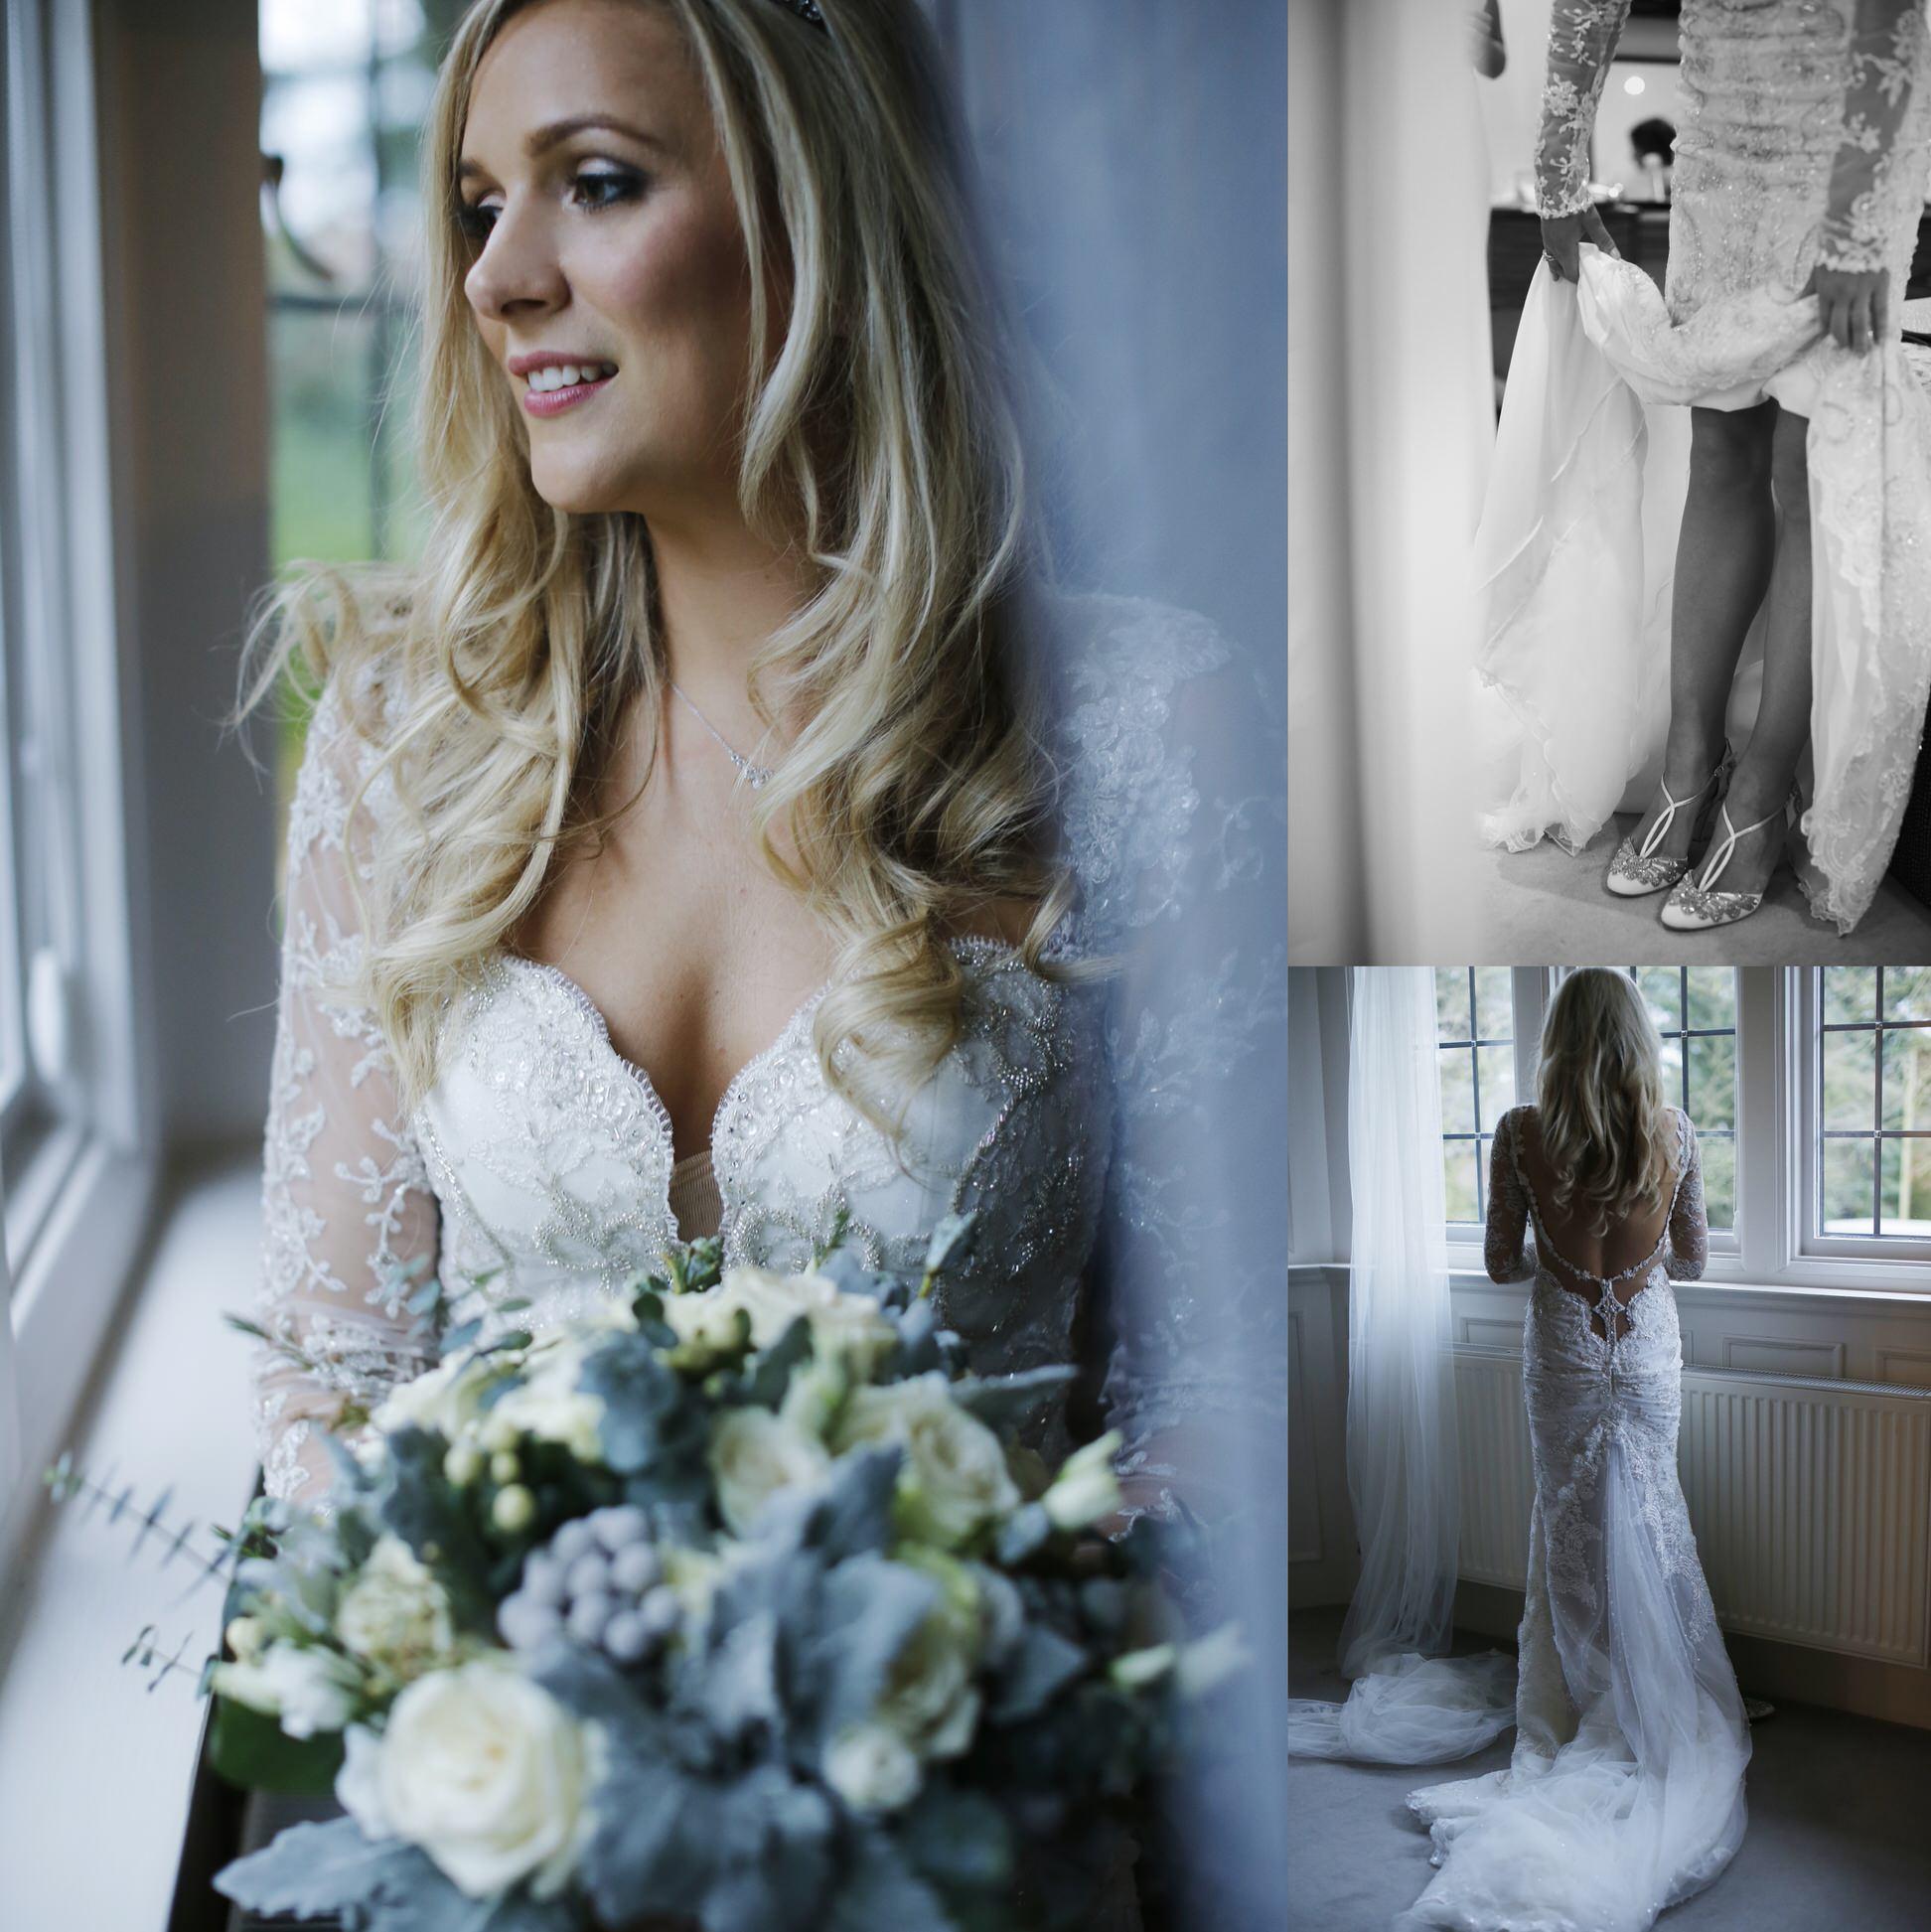 brett-harkness-winter-wedding-uk-wedding-photographer_0008.jpg